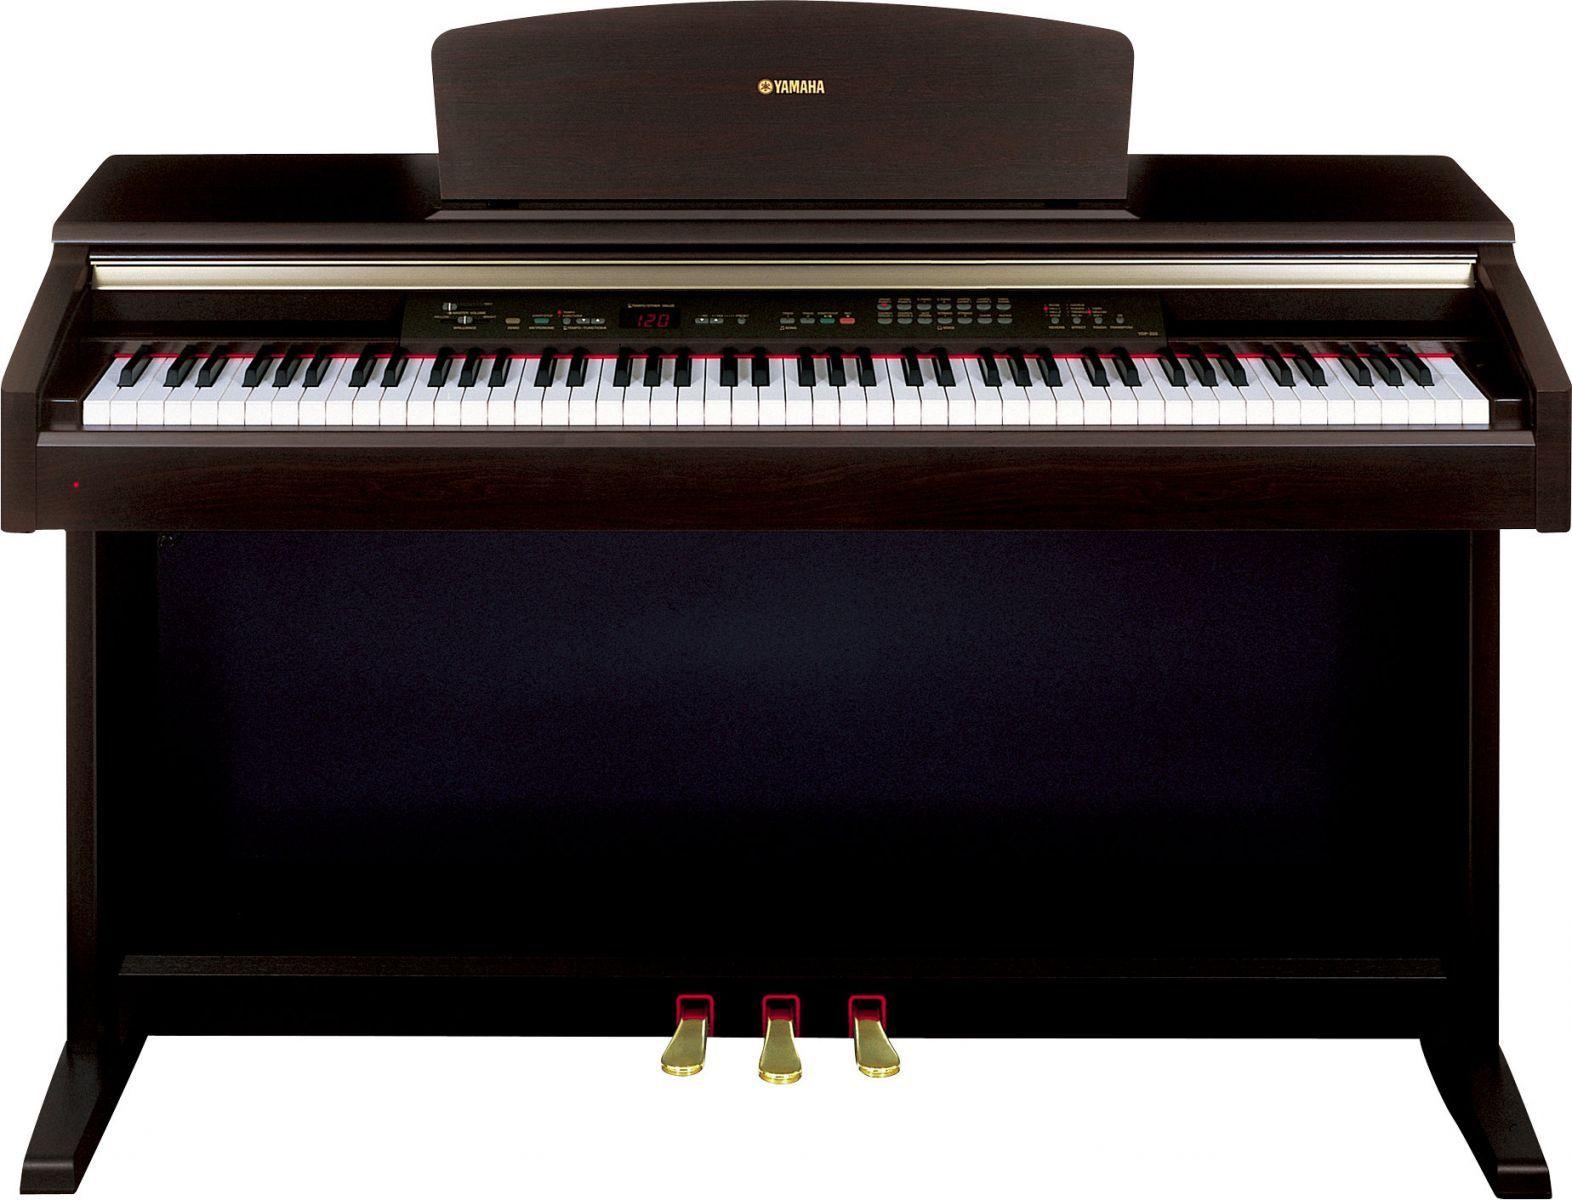 n piano yamaha clavinova clp 120 best digital piano piano best digital piano yamaha clp. Black Bedroom Furniture Sets. Home Design Ideas